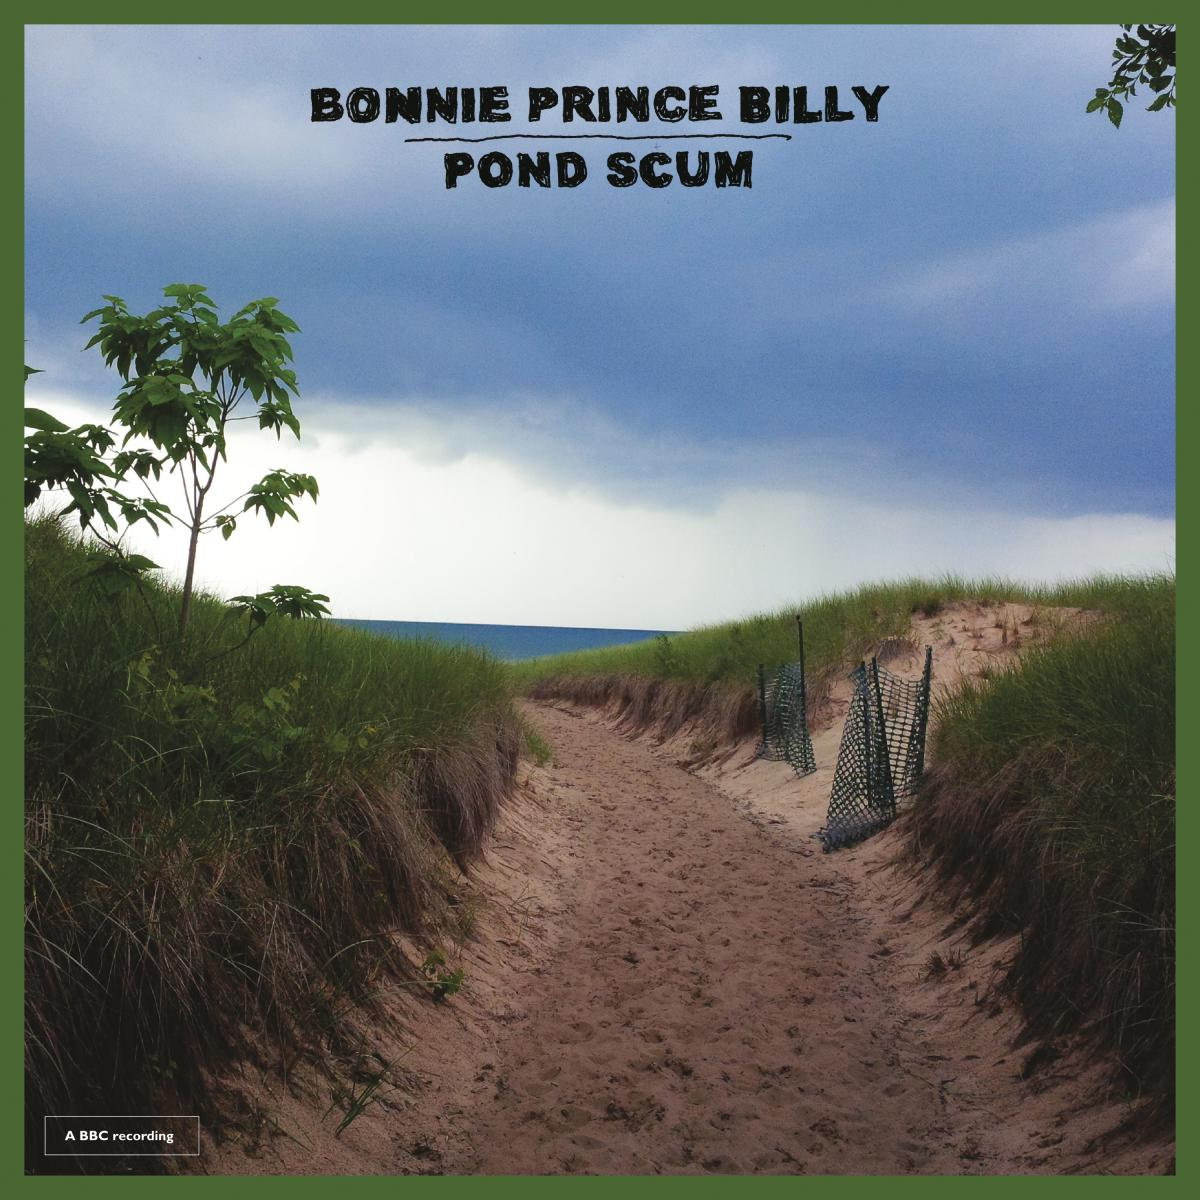 'Pond Scum' by Bonnie Prince Billy album review